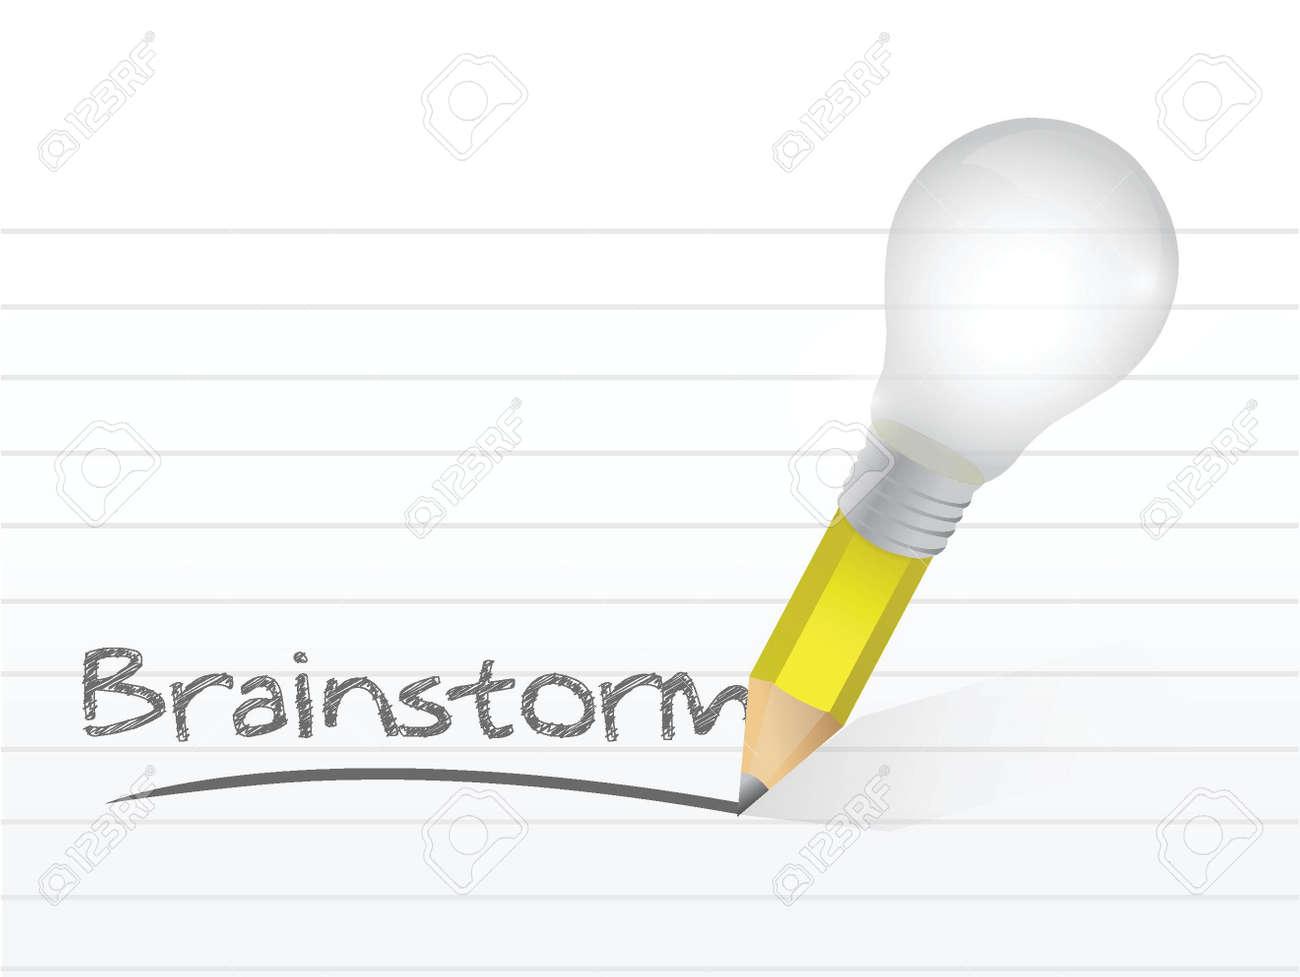 brainstorm written with a light bulb idea pencil illustration design over notepad paper Stock Vector - 20760548